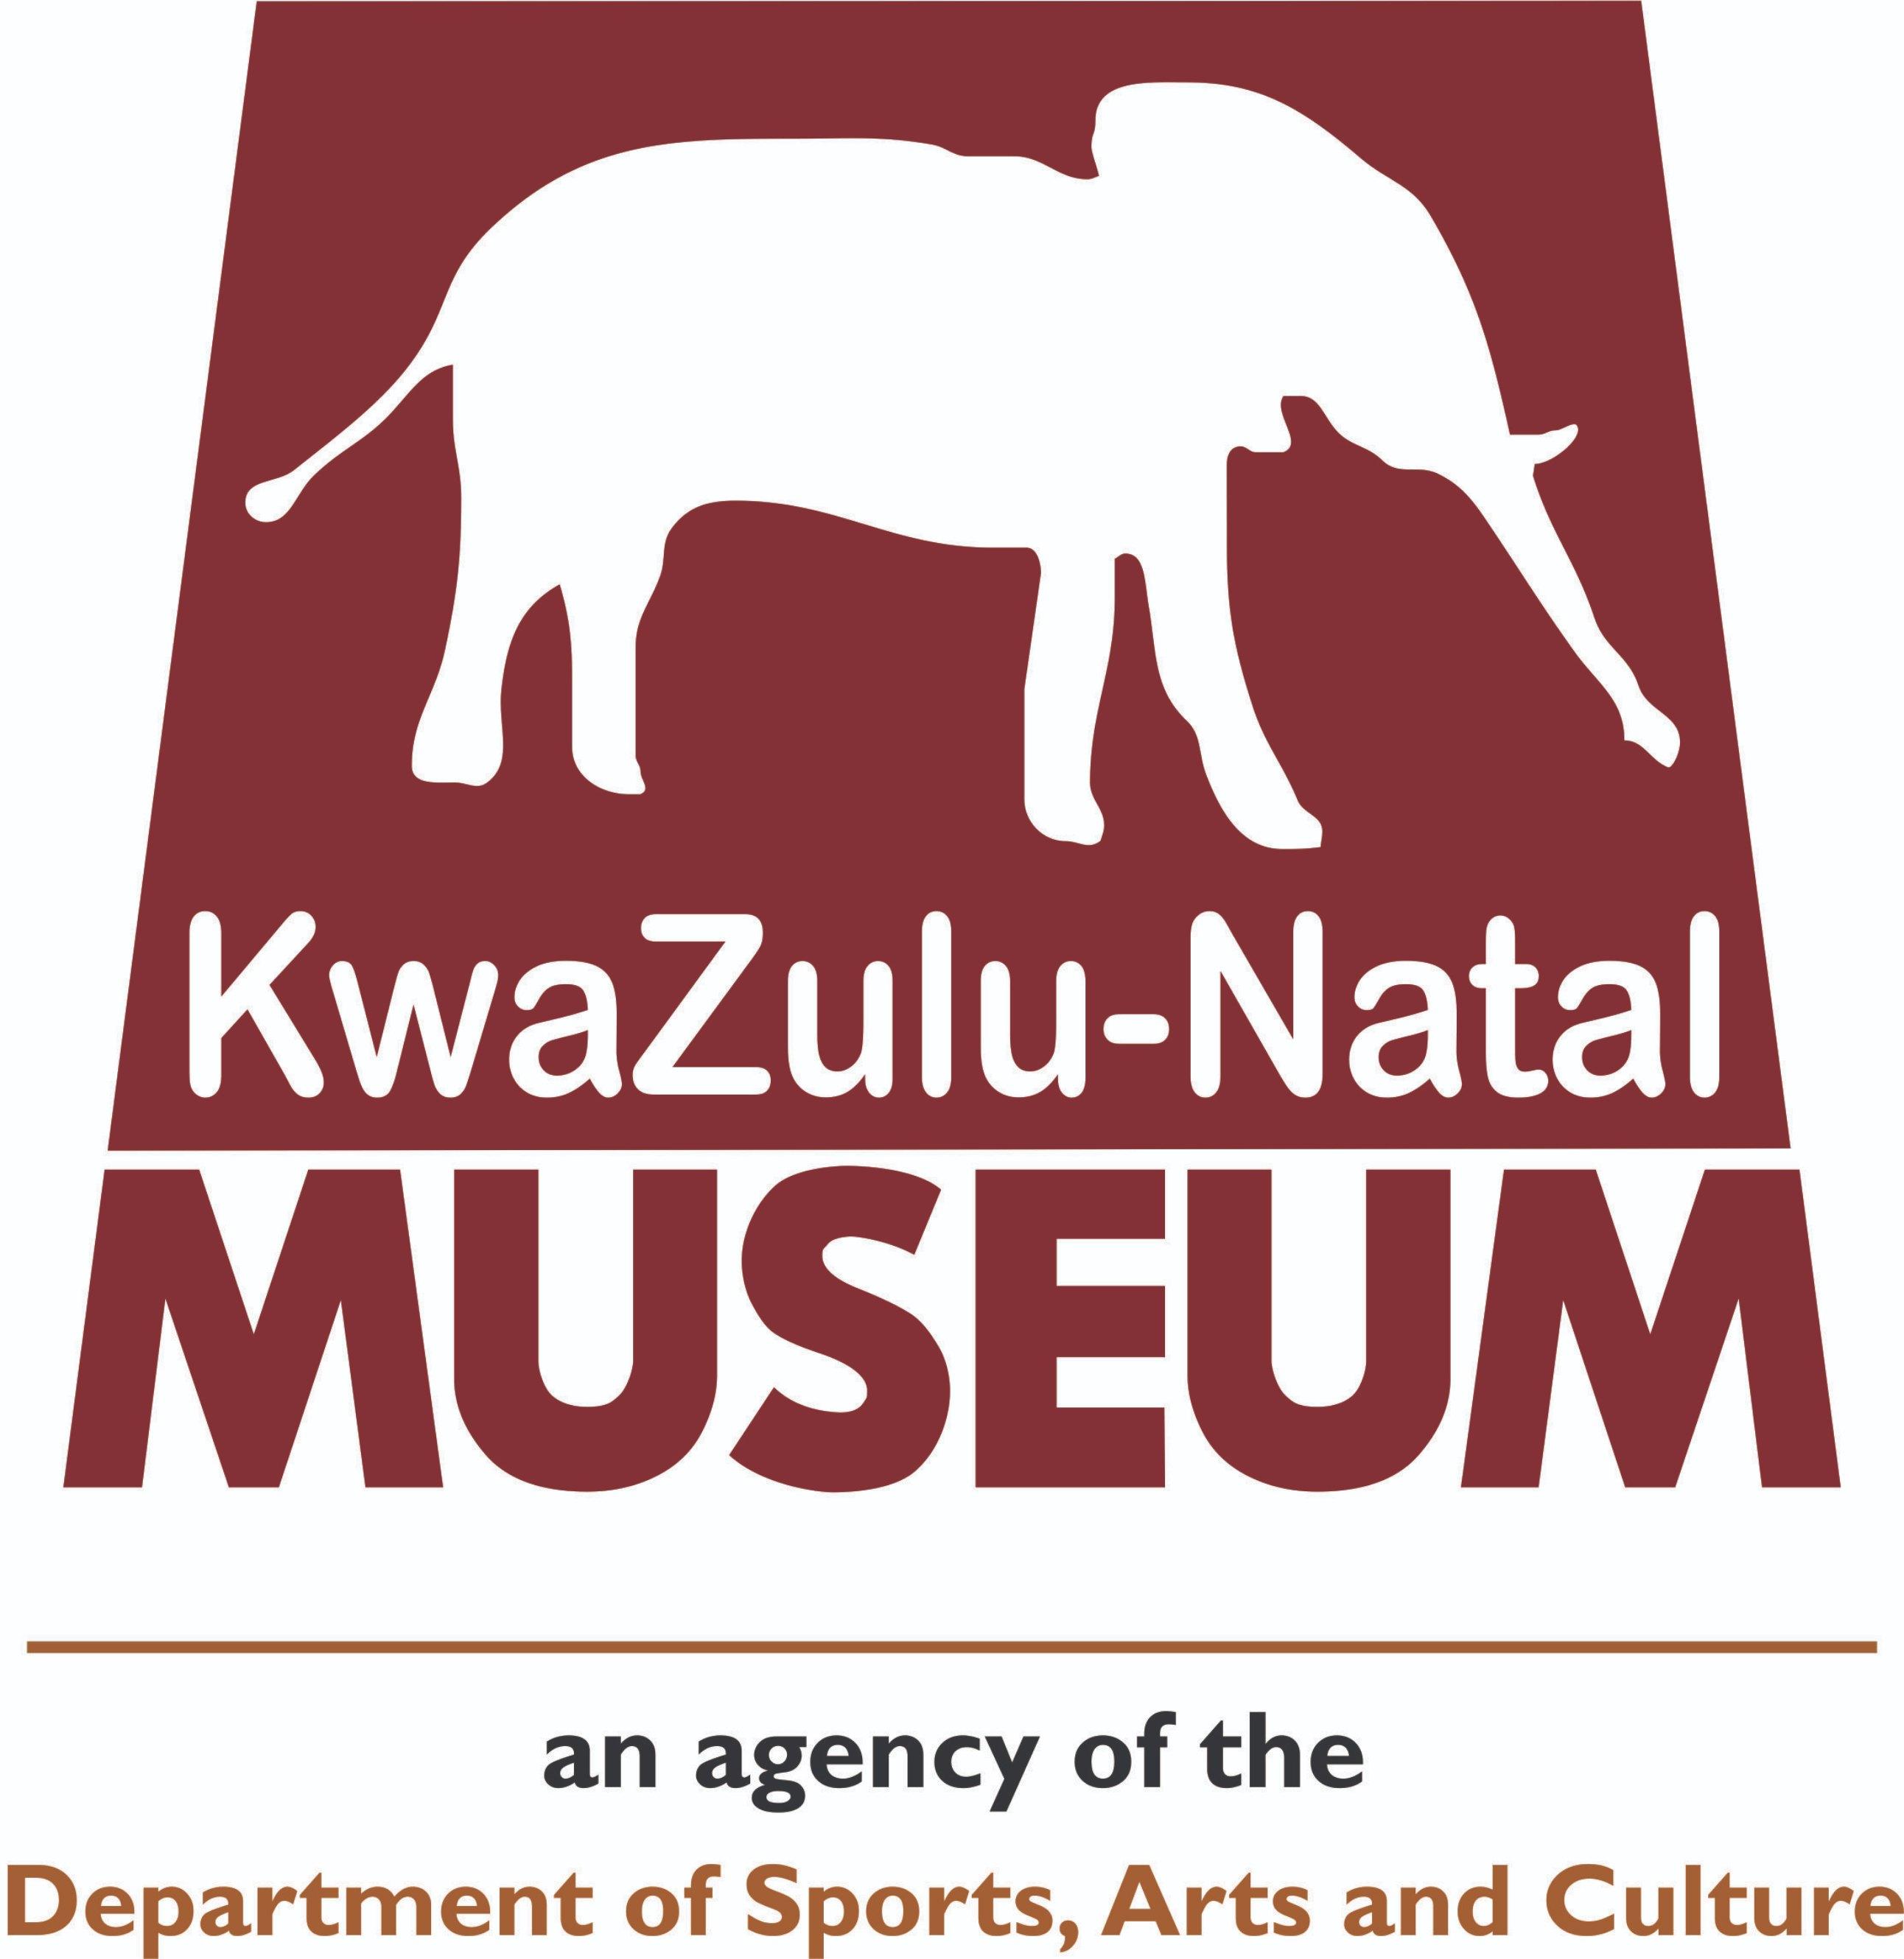 KwaZulu-Natal Museum